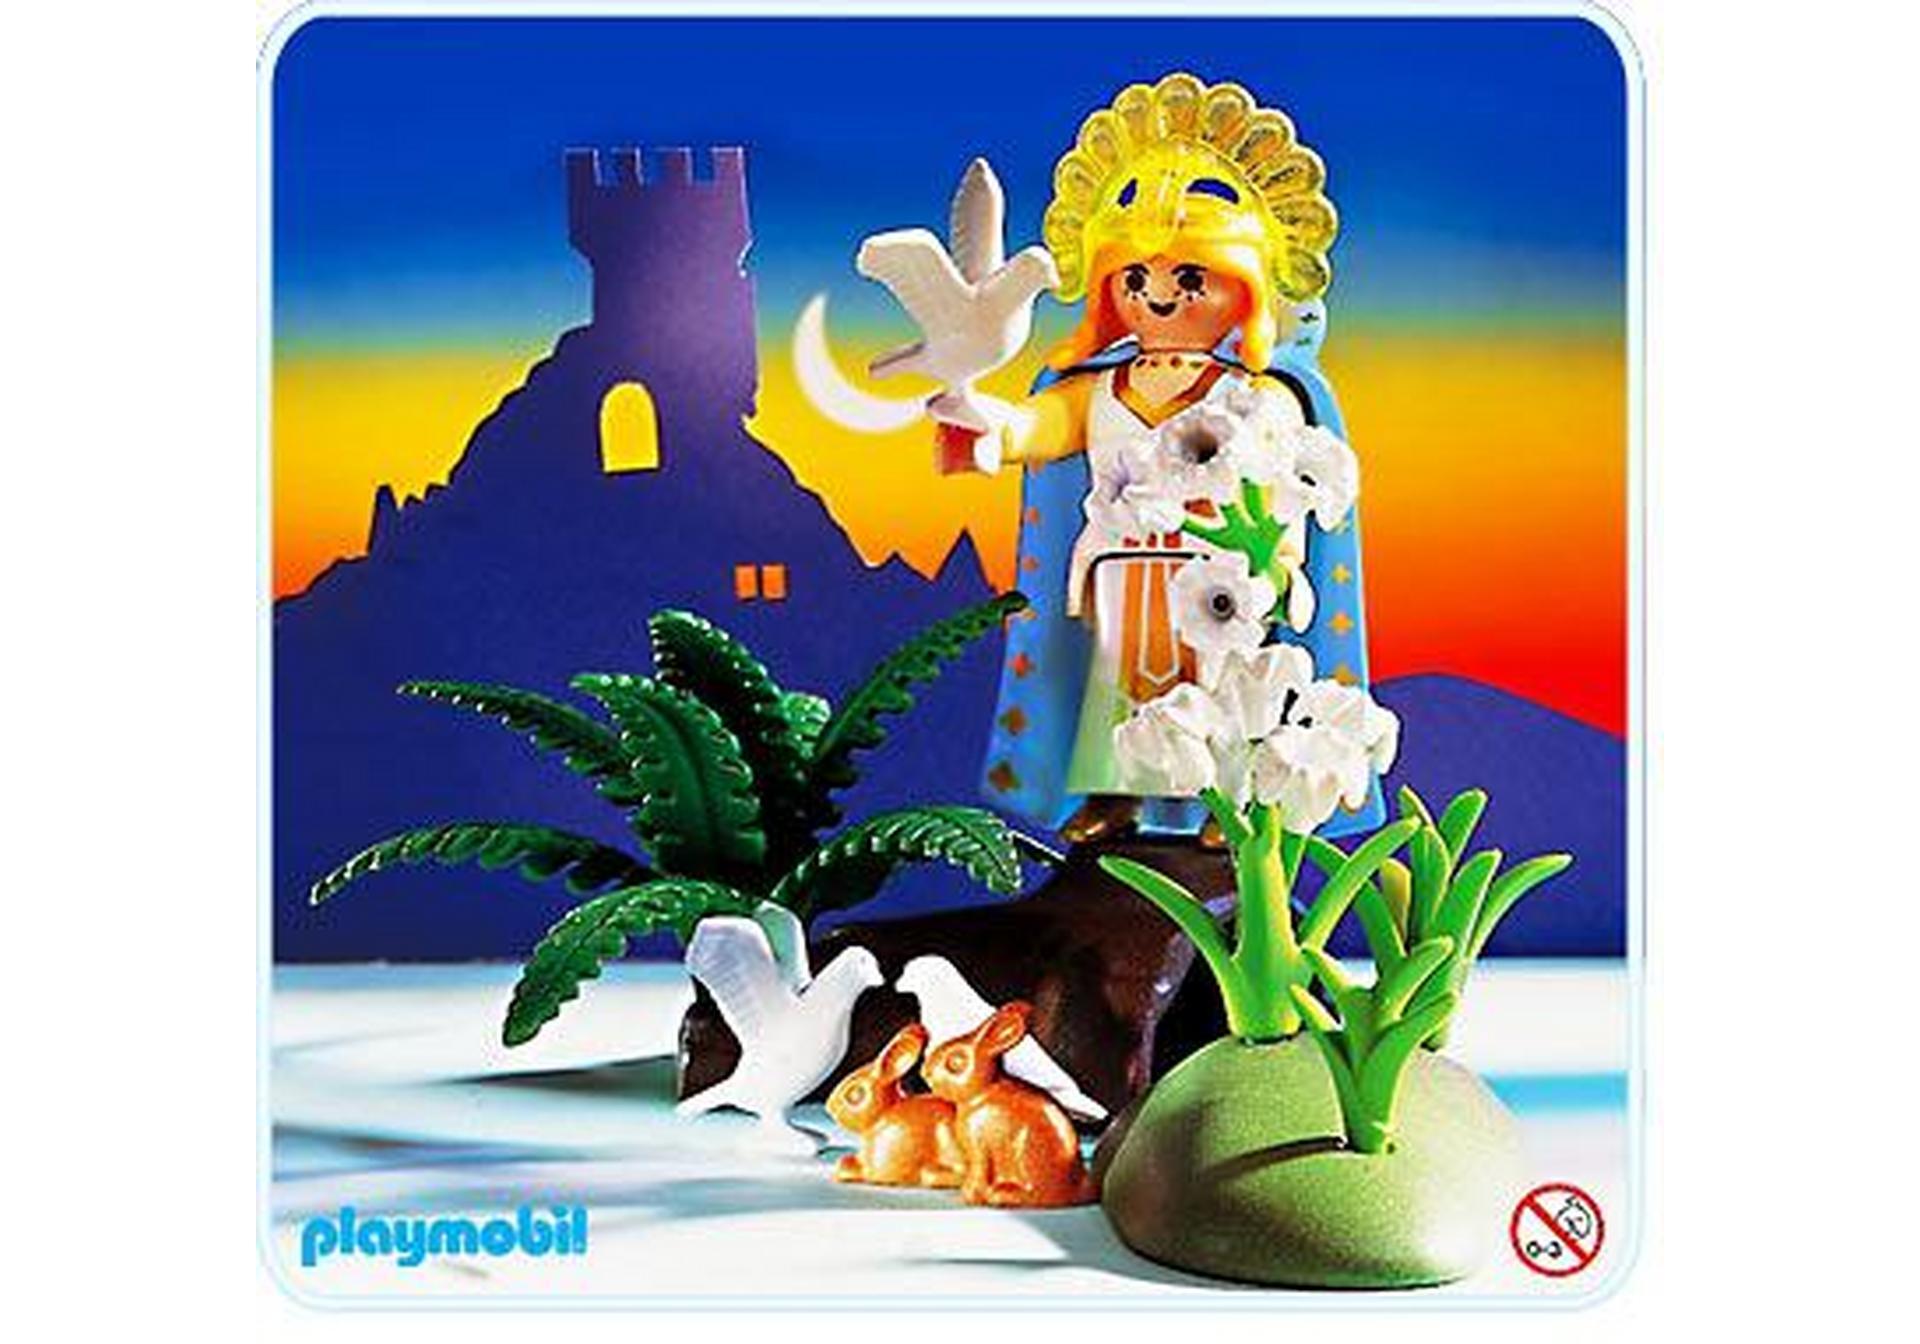 Bonne f e 3836 a playmobil france for Playmobil buanderie